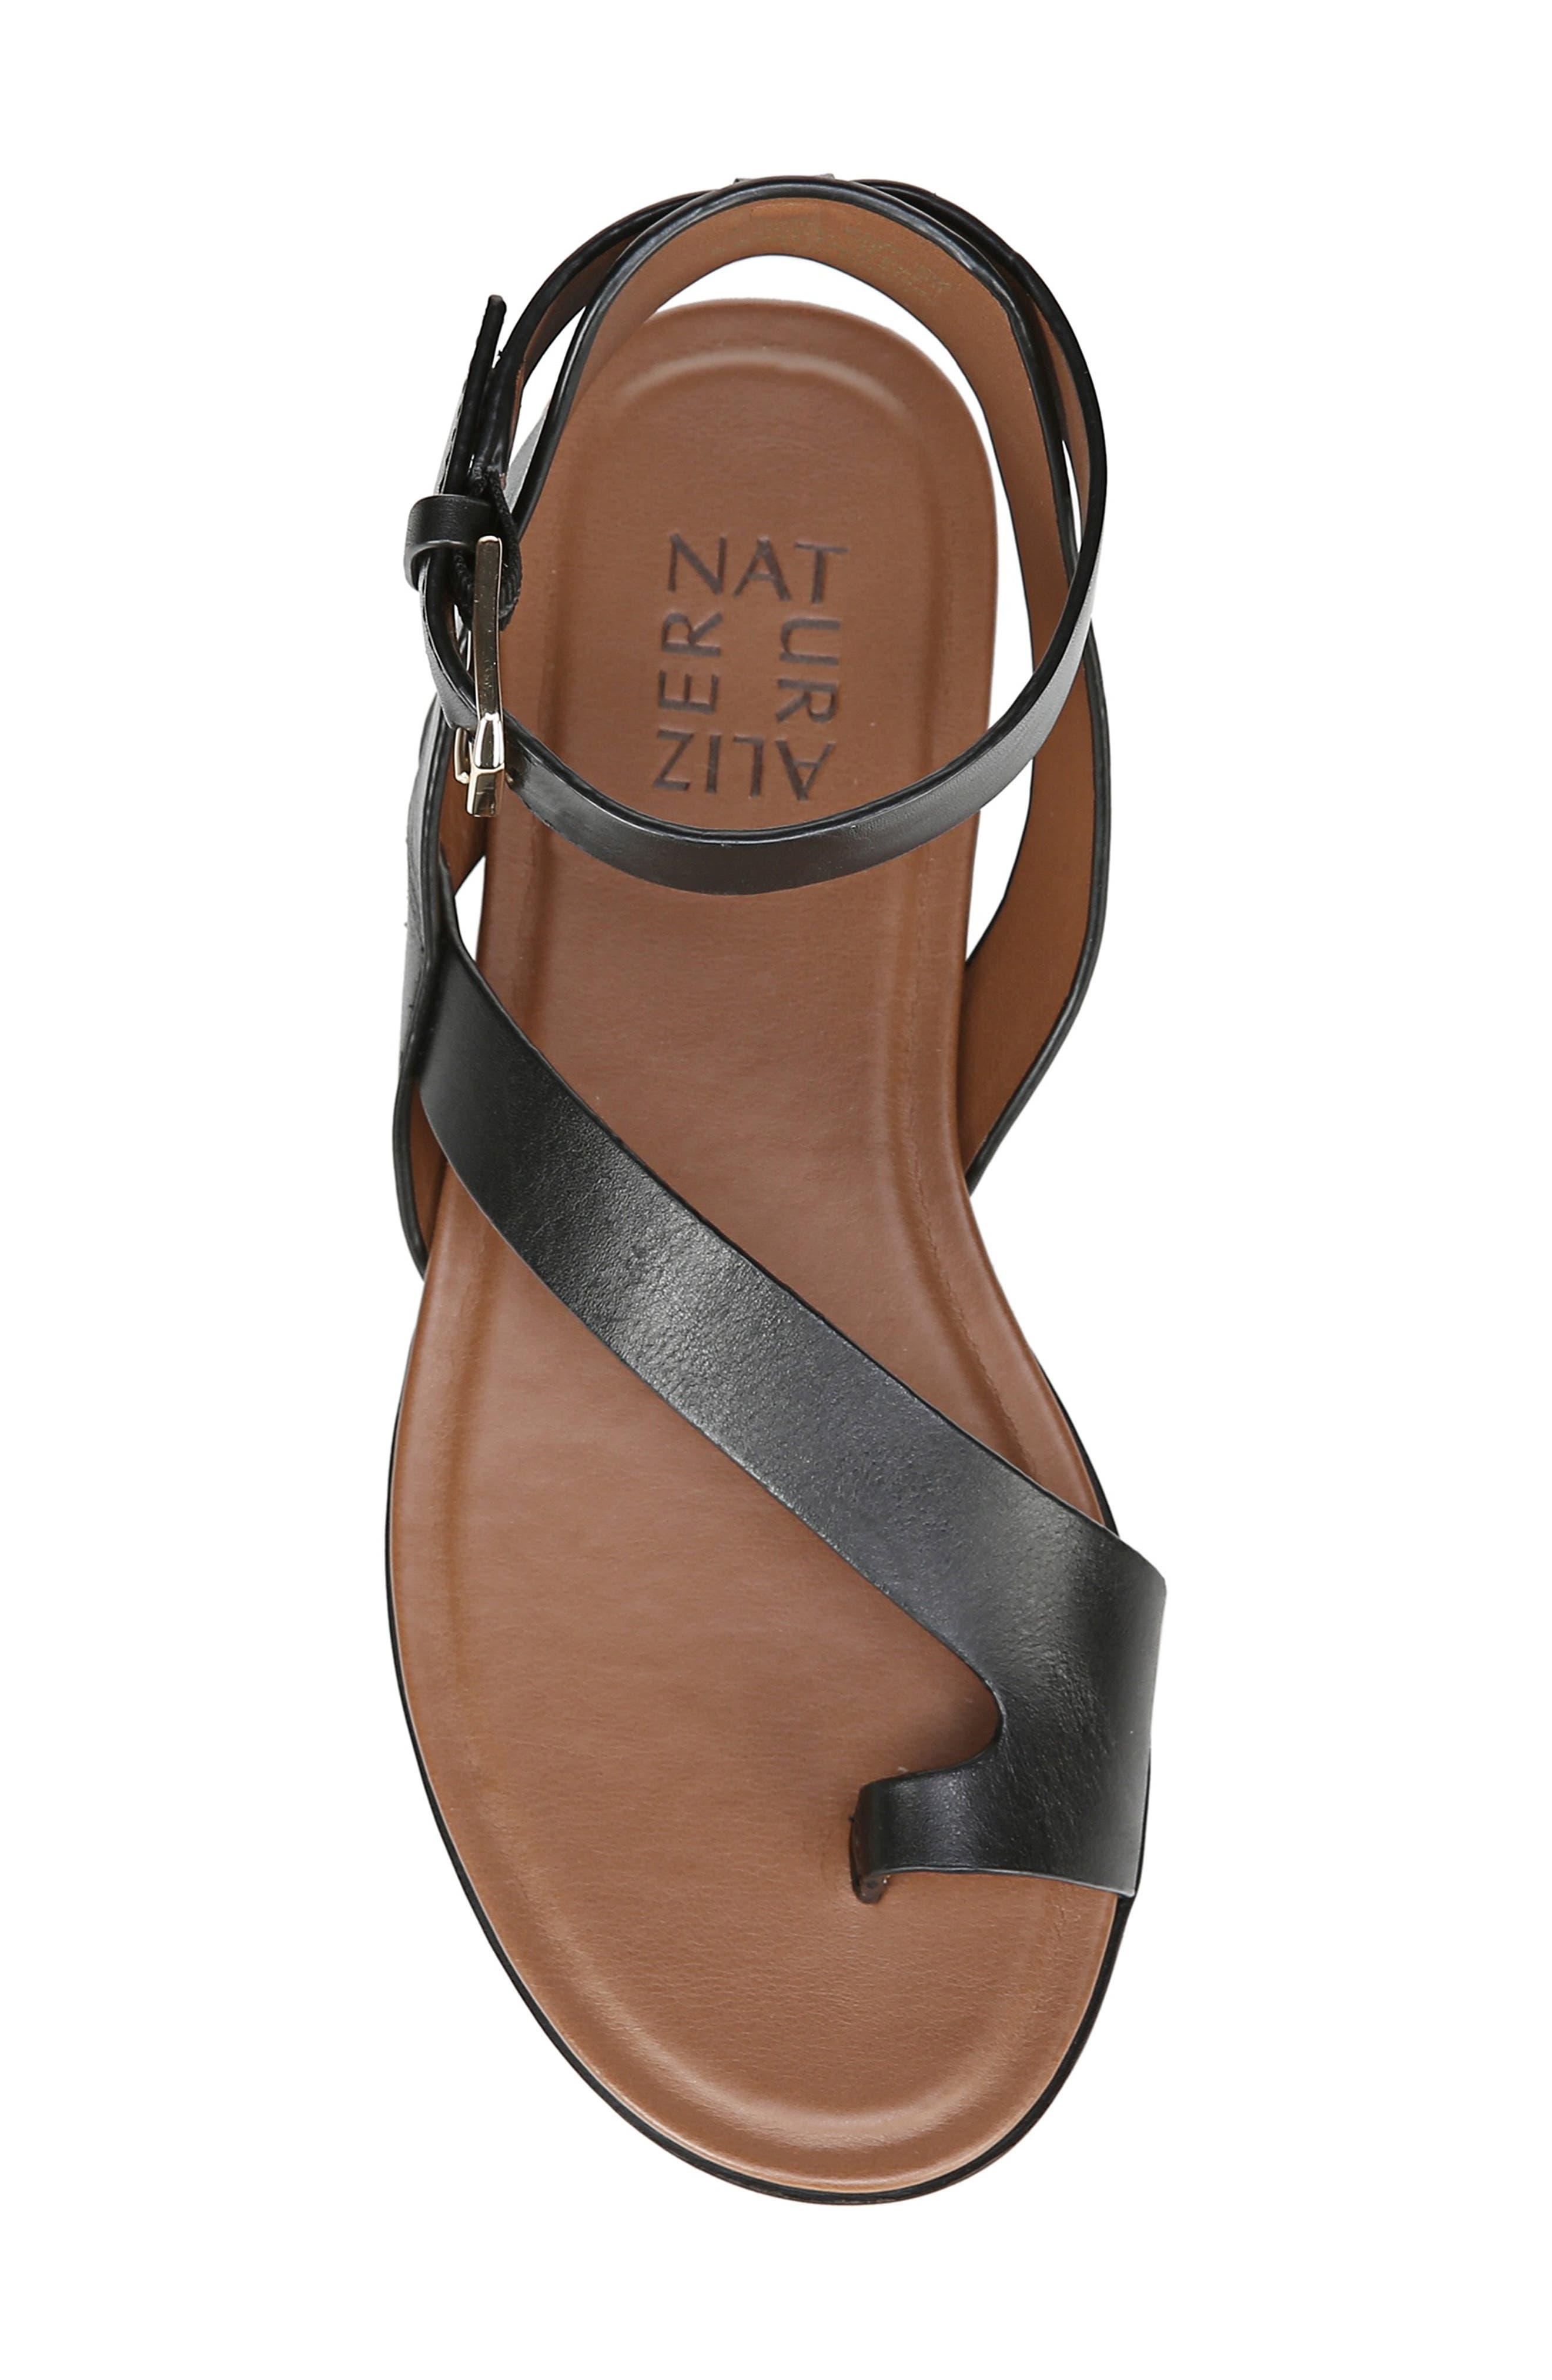 Tally Ankle Strap Sandal,                             Alternate thumbnail 5, color,                             BLACK LEATHER